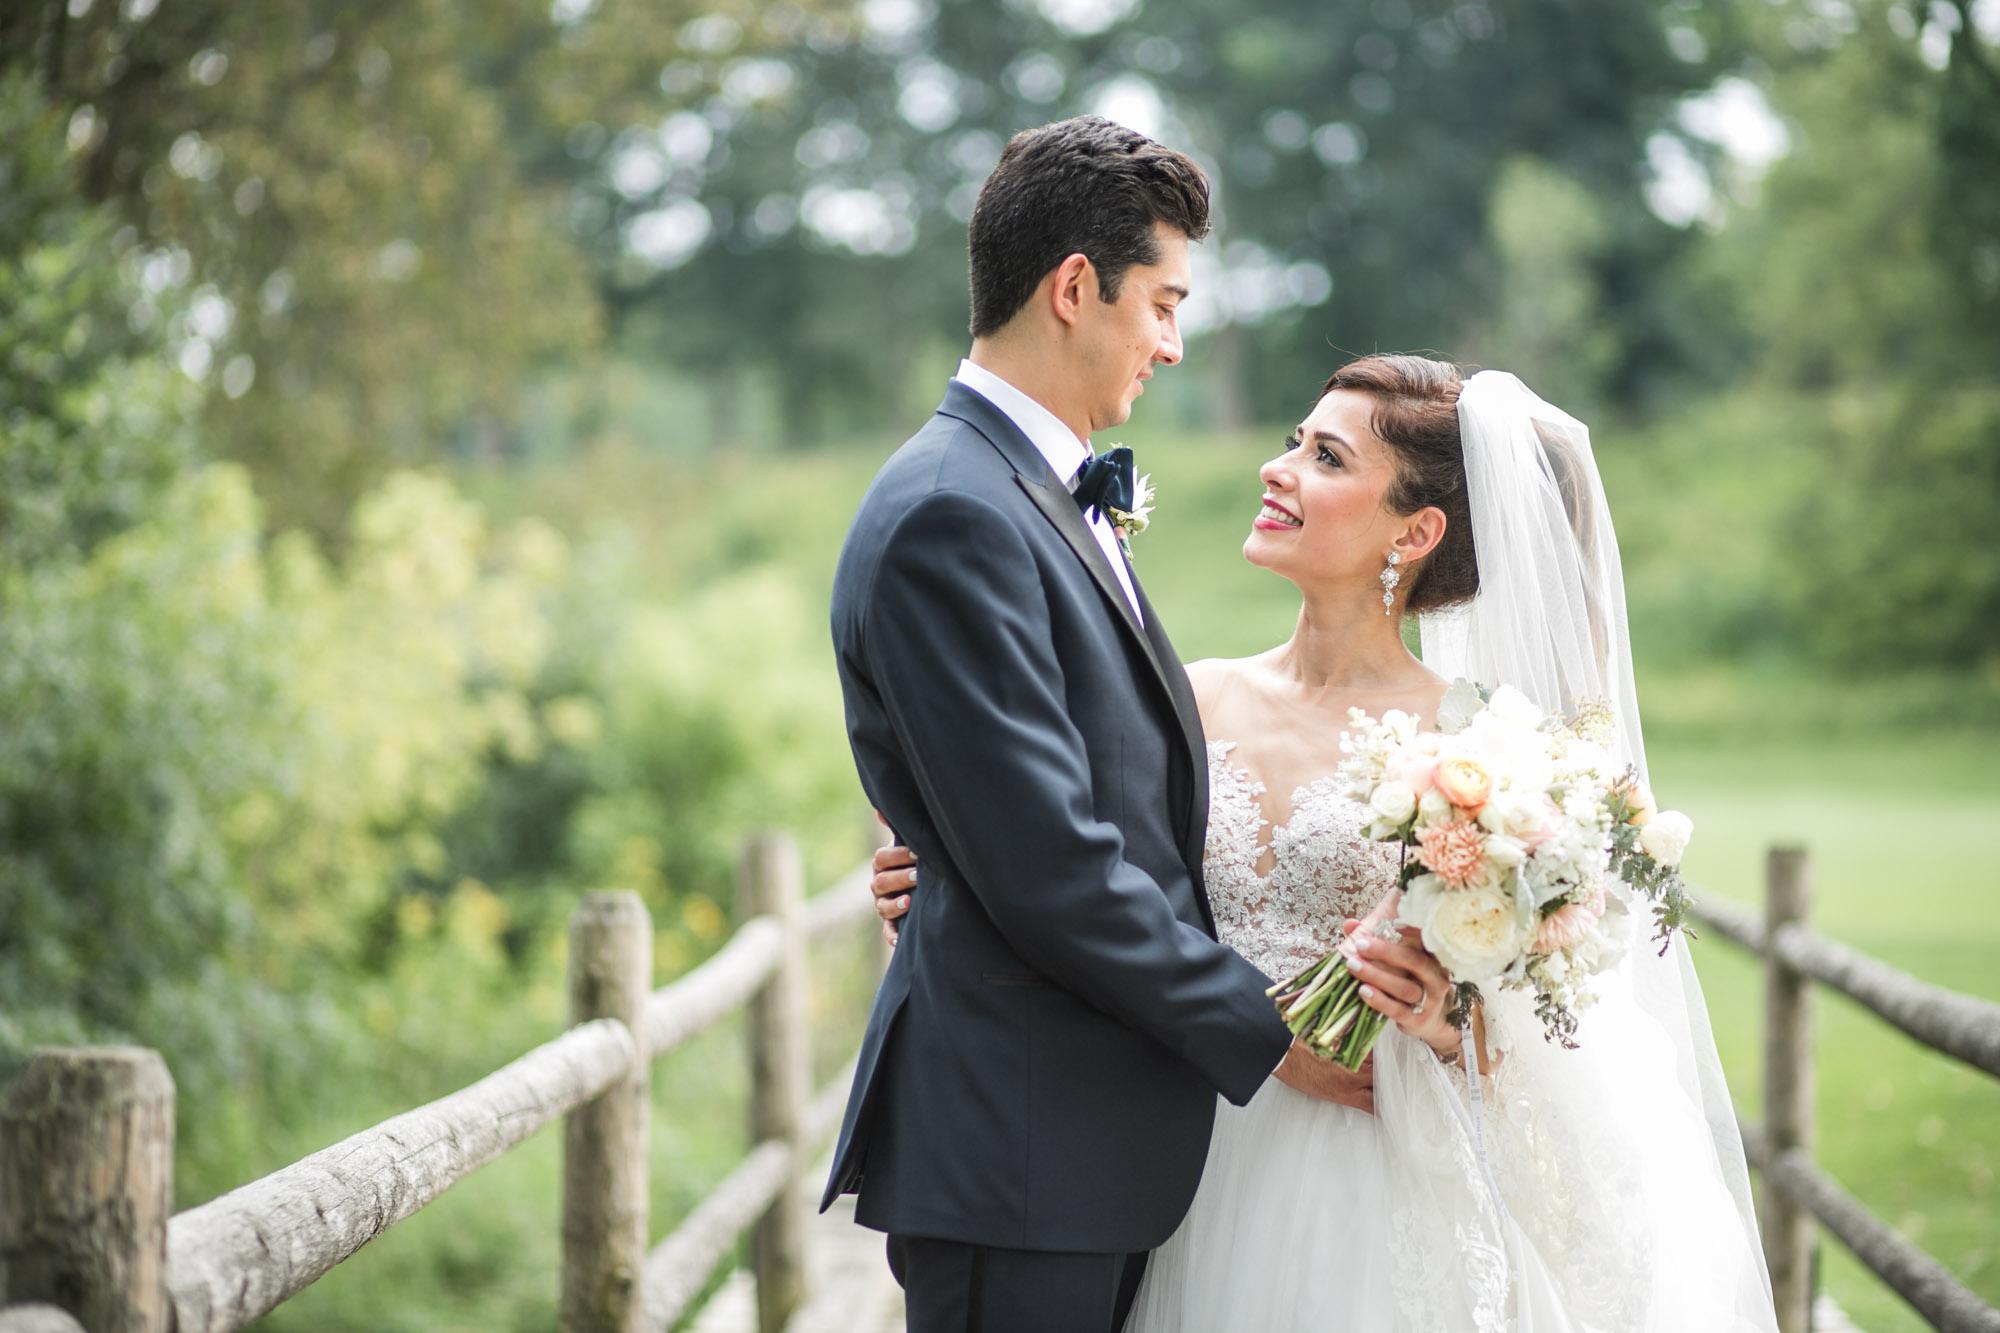 sylvania-country-club-wedding-photos-71.jpg